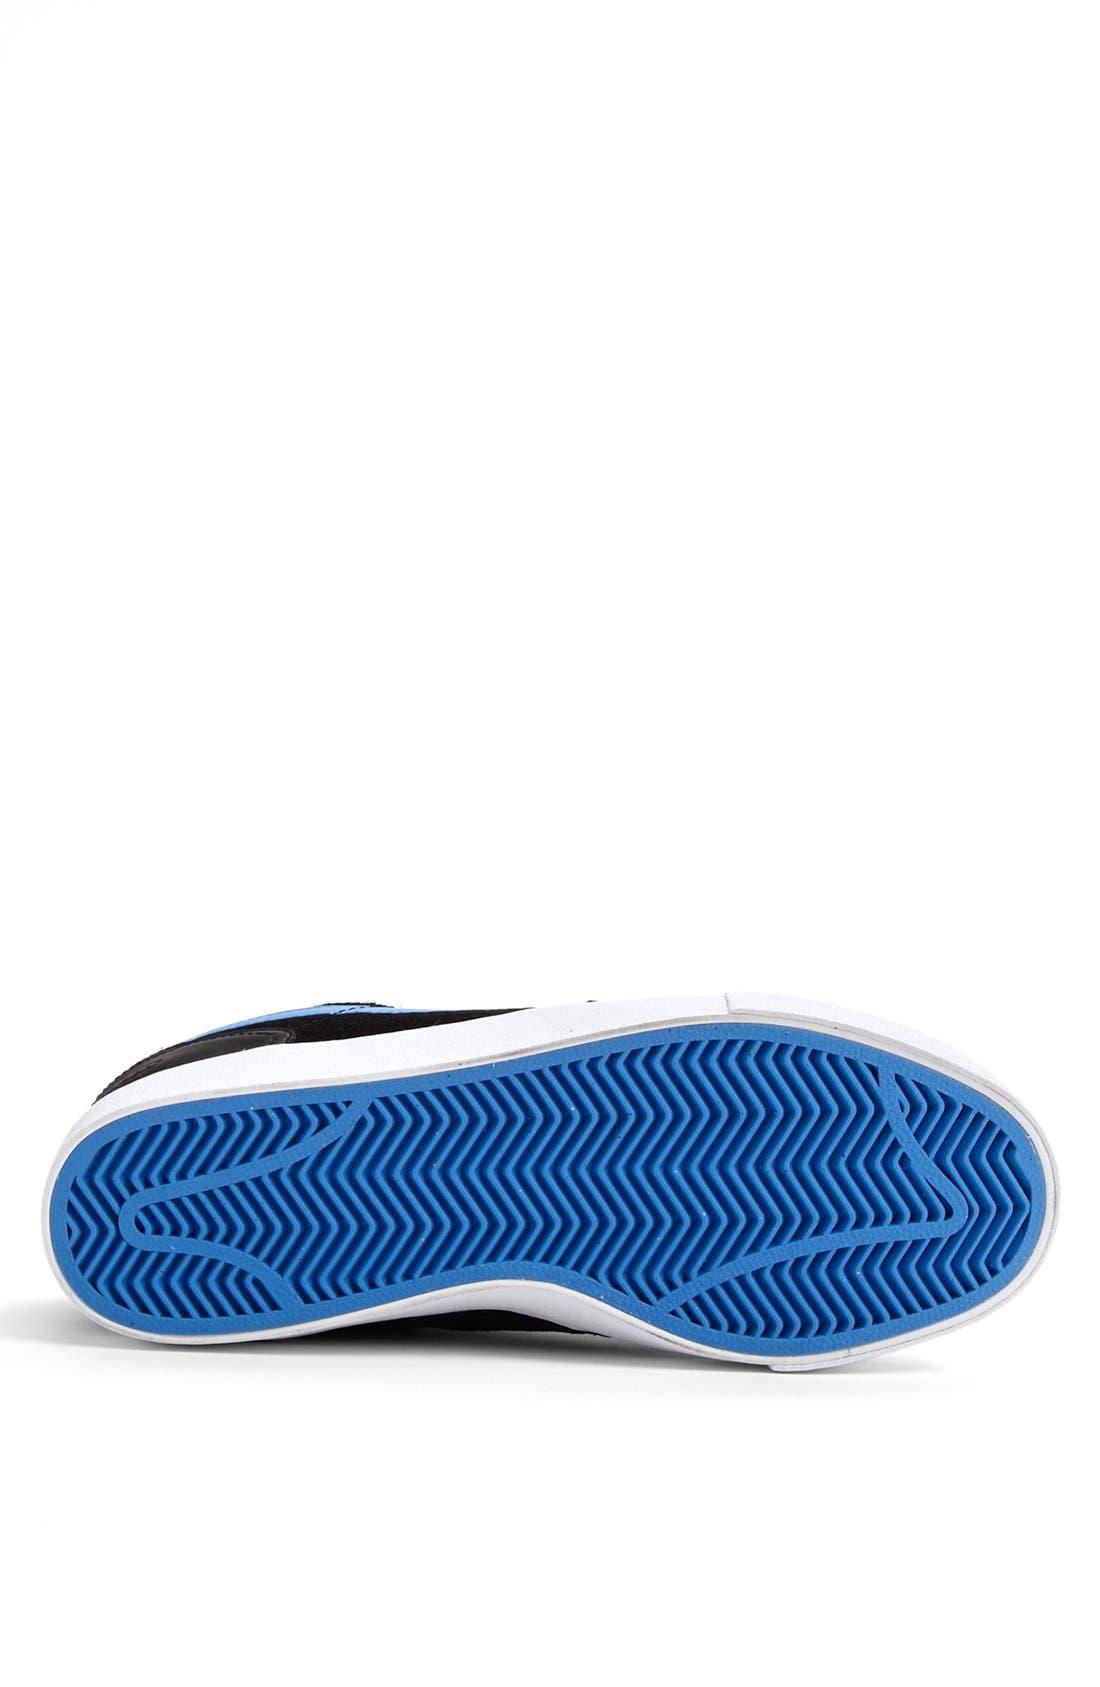 Alternate Image 4  - Nike 'Paul Rodriguez 5 LR' Sneaker (Men)